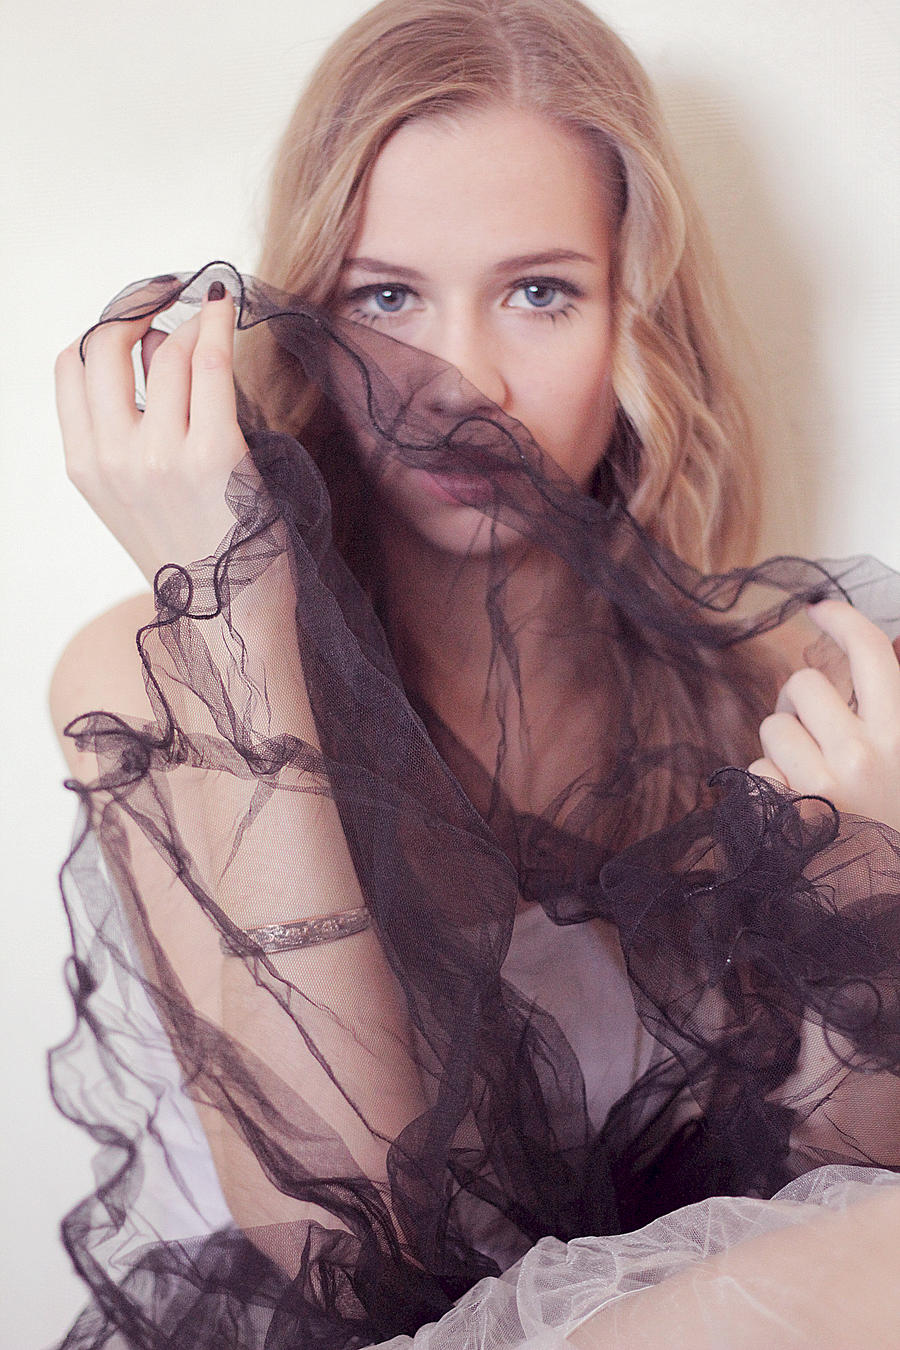 sweet beauty by RamonaAnomar